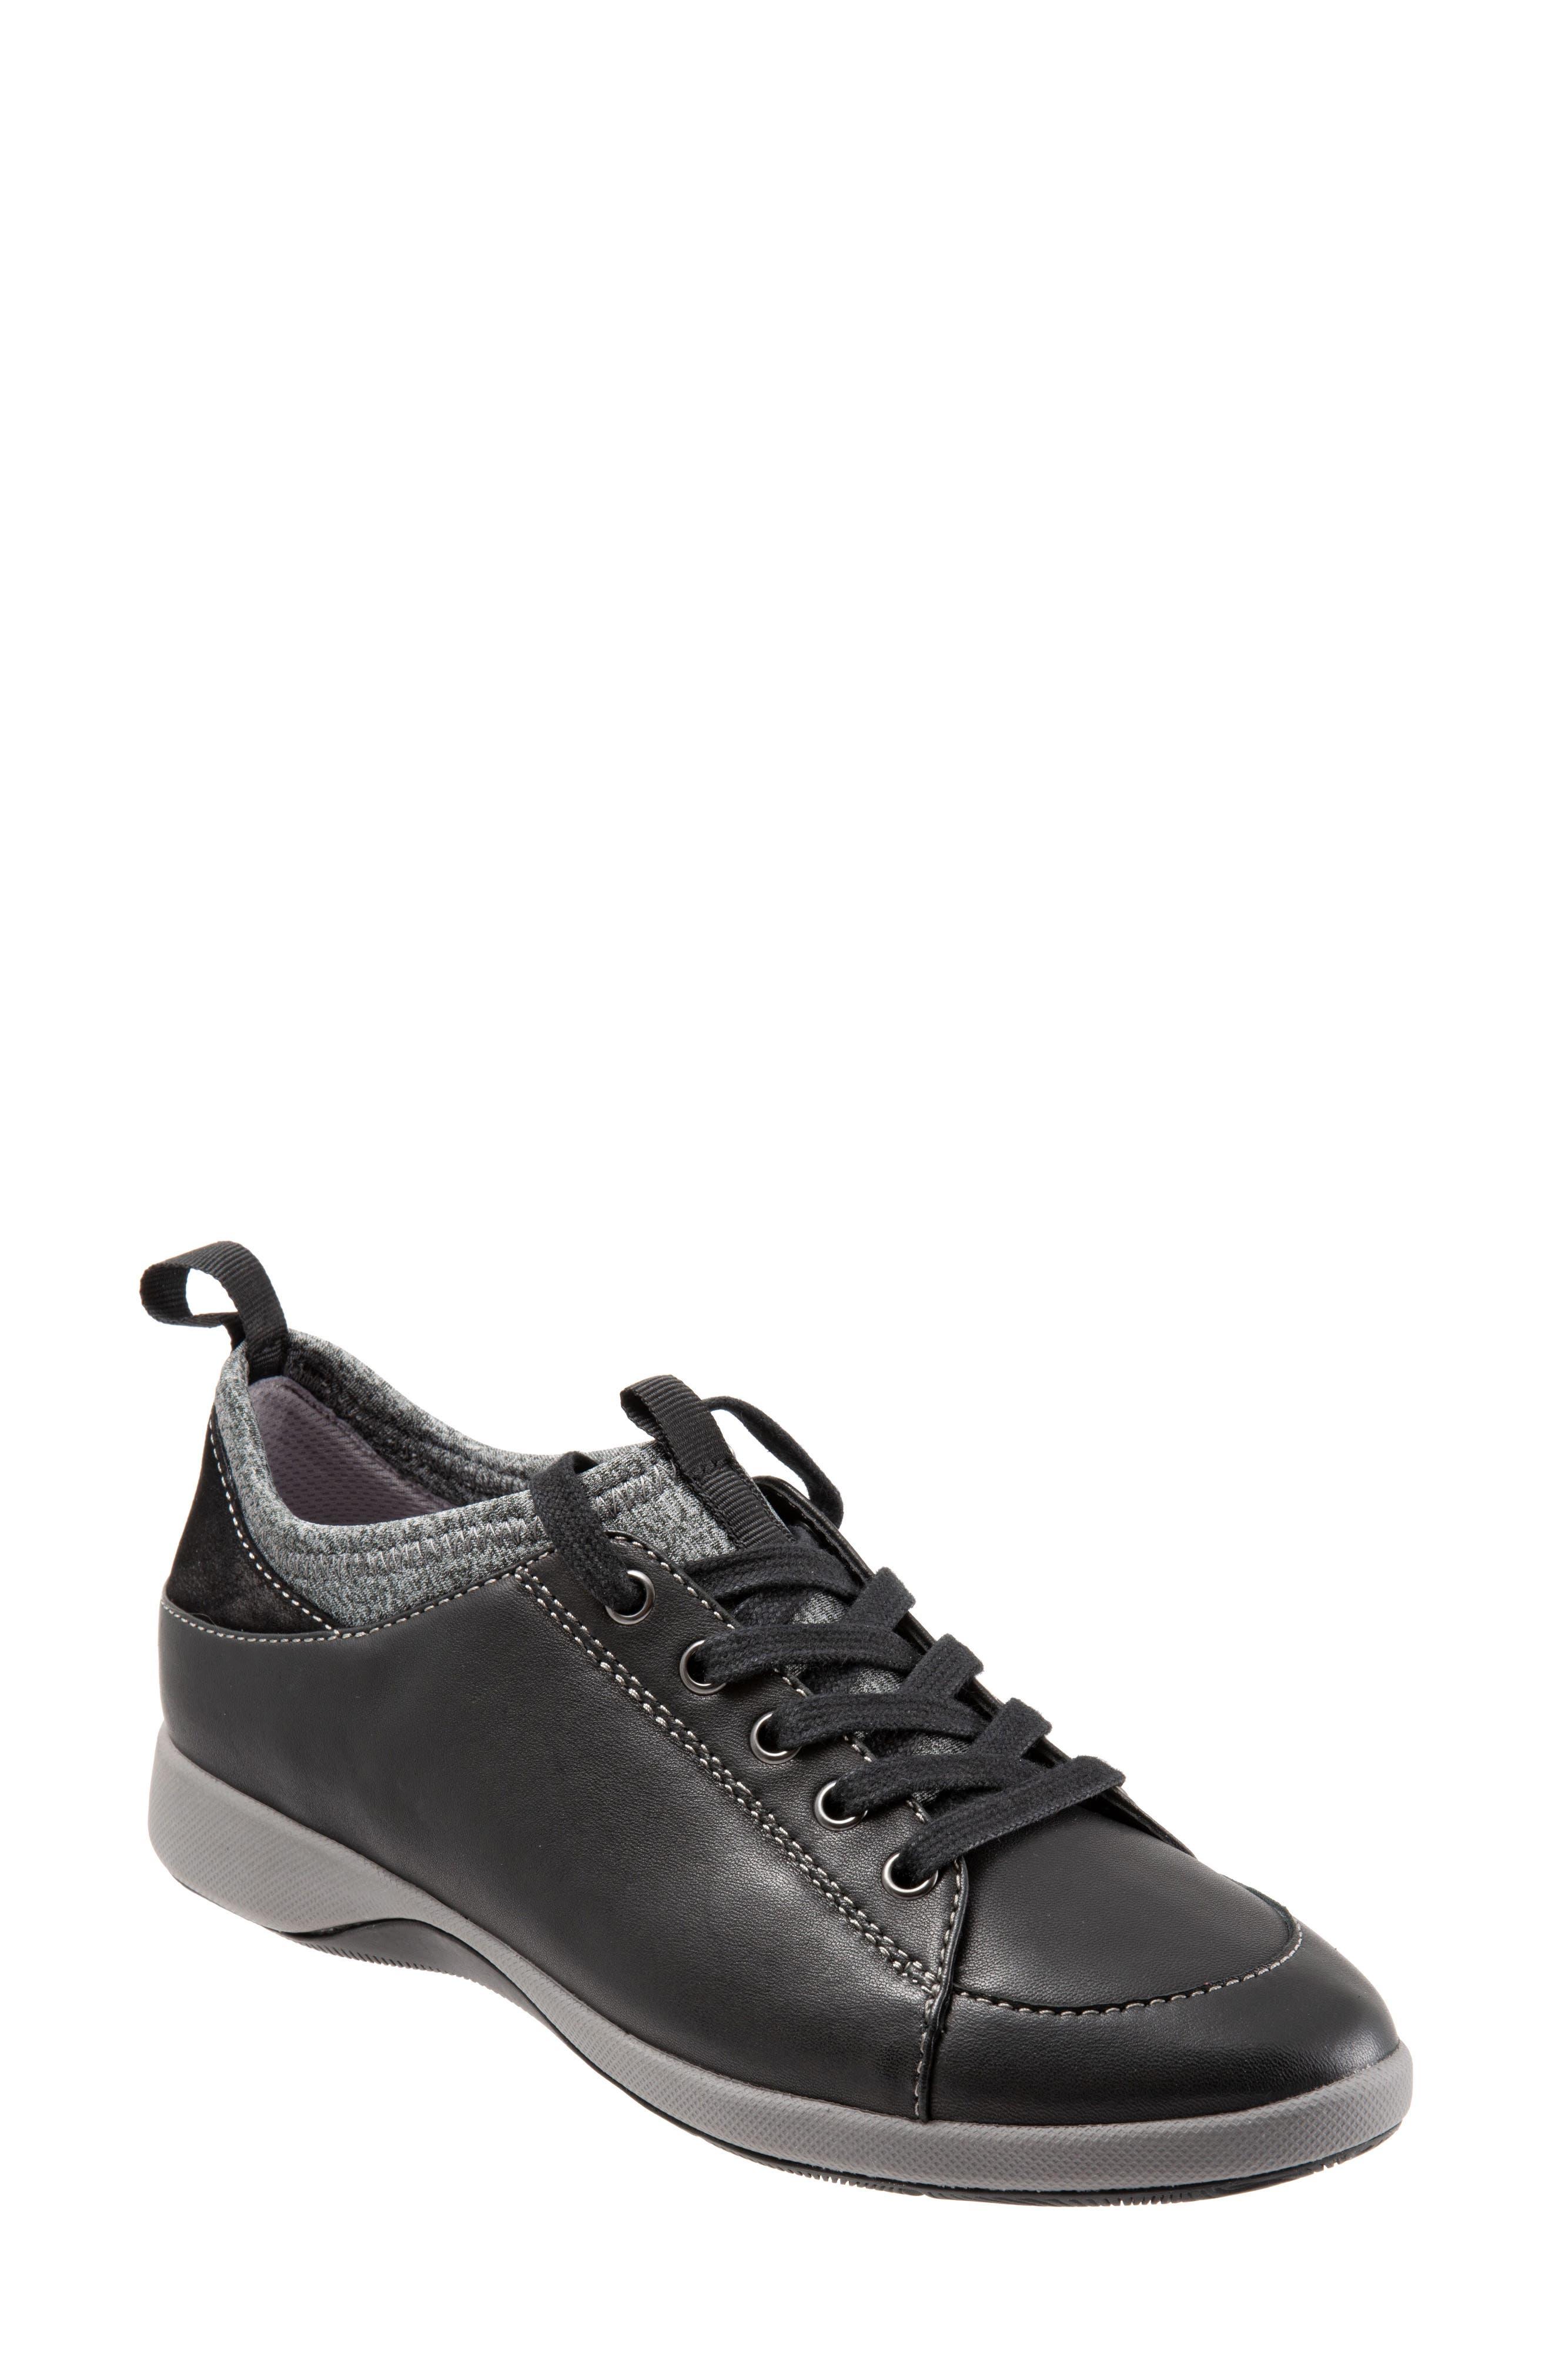 SOFTWALK<SUP>®</SUP>, SAVA Haven Sneaker, Main thumbnail 1, color, BLACK/ GREY LEATHER